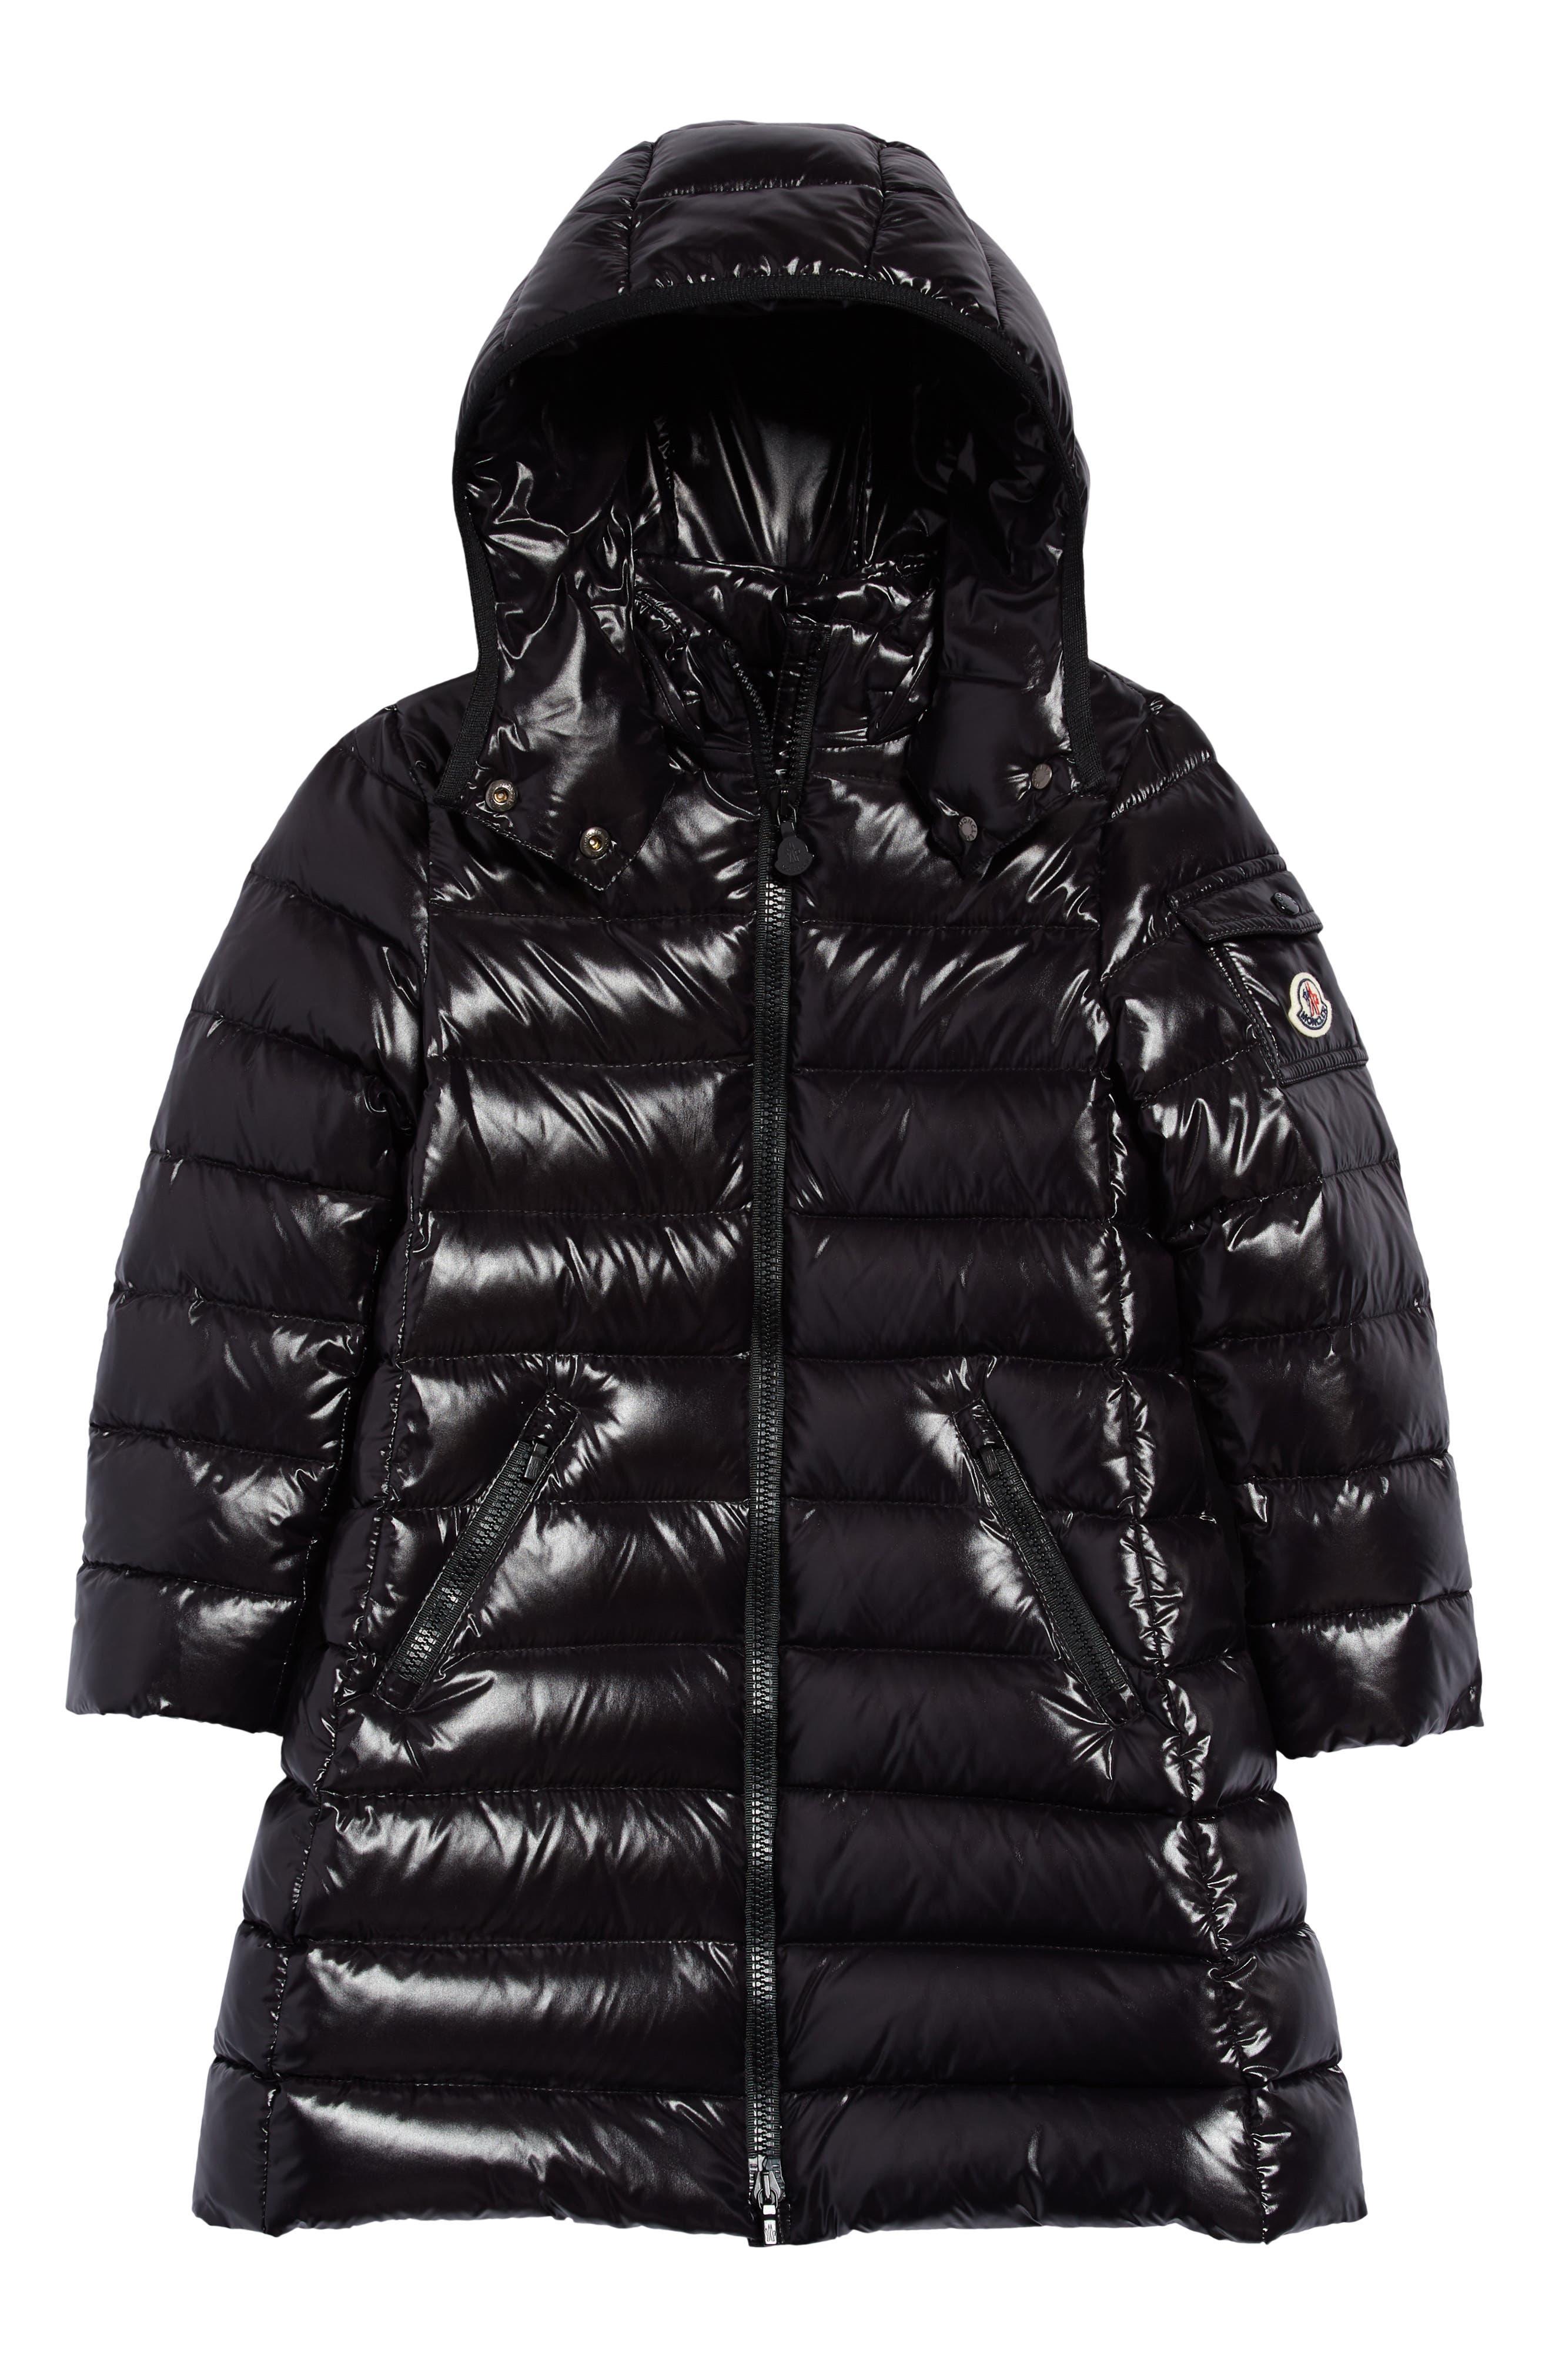 Phorecys Girls Boys Fashion Waterproof Glossy Down Parkas Jackets Long Style Hooded Puffer Coats